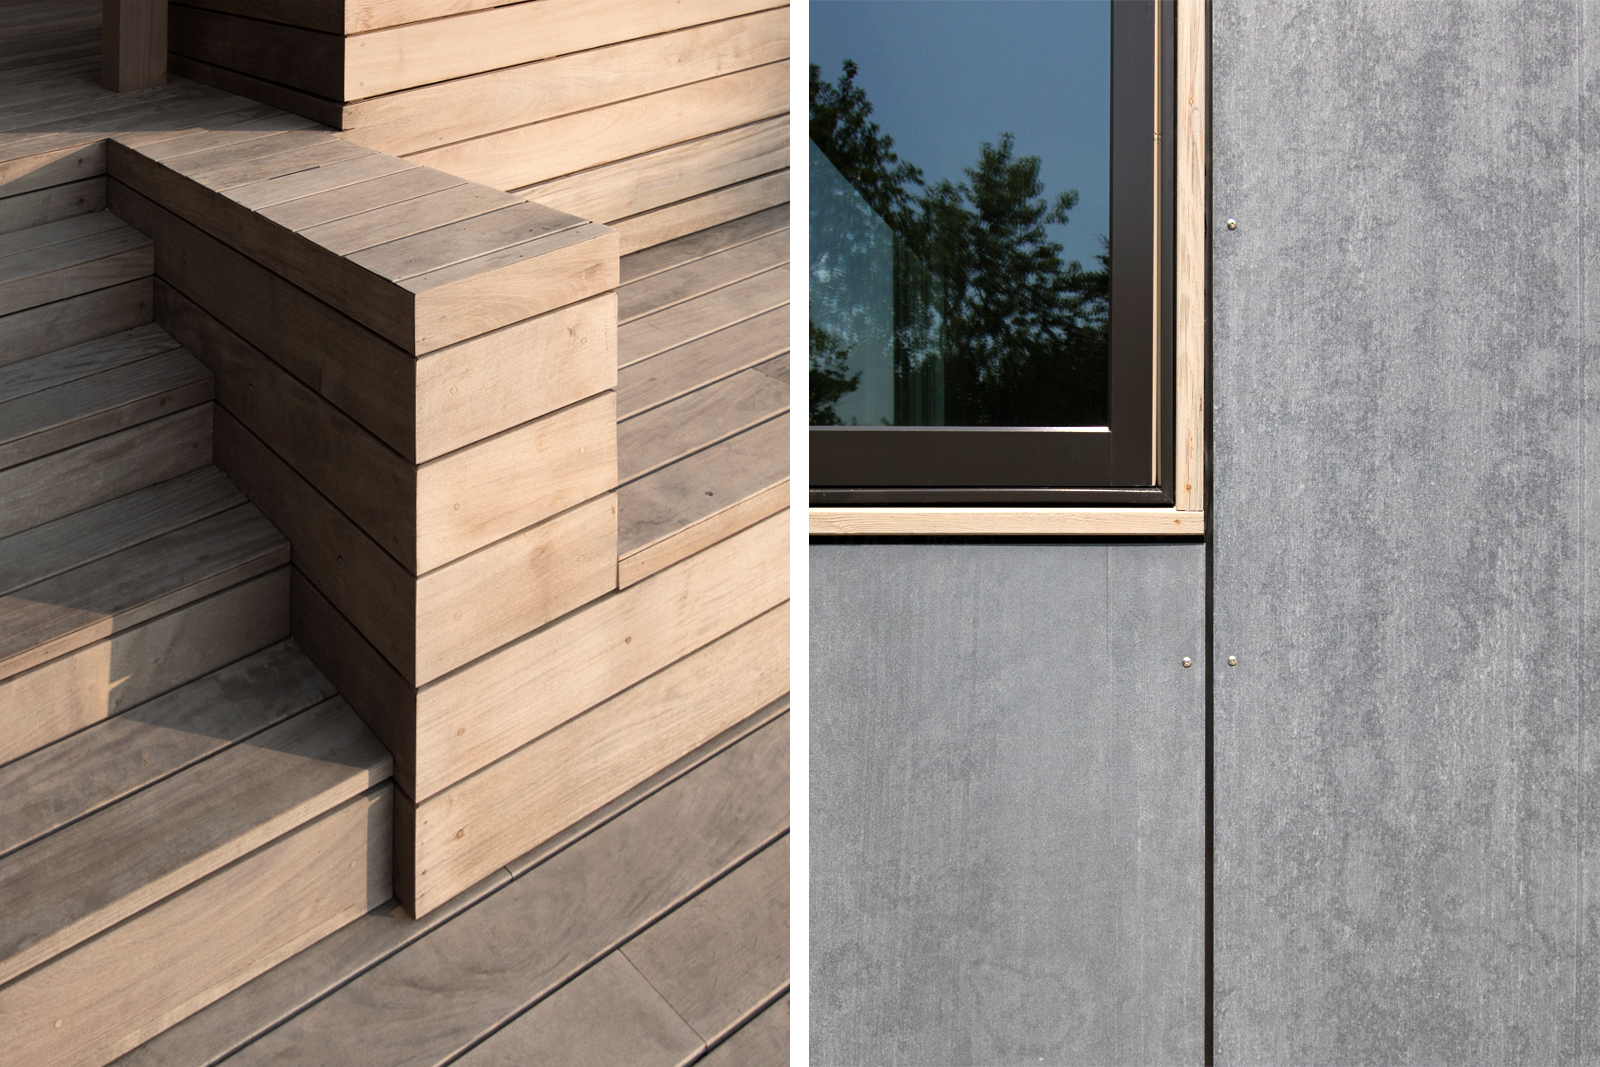 08-res4-resolution-4-architecture-modern-modular-house-prefab-home-north-fork-bluff-house-exterior-steps-bench-facade-window-details.jpg